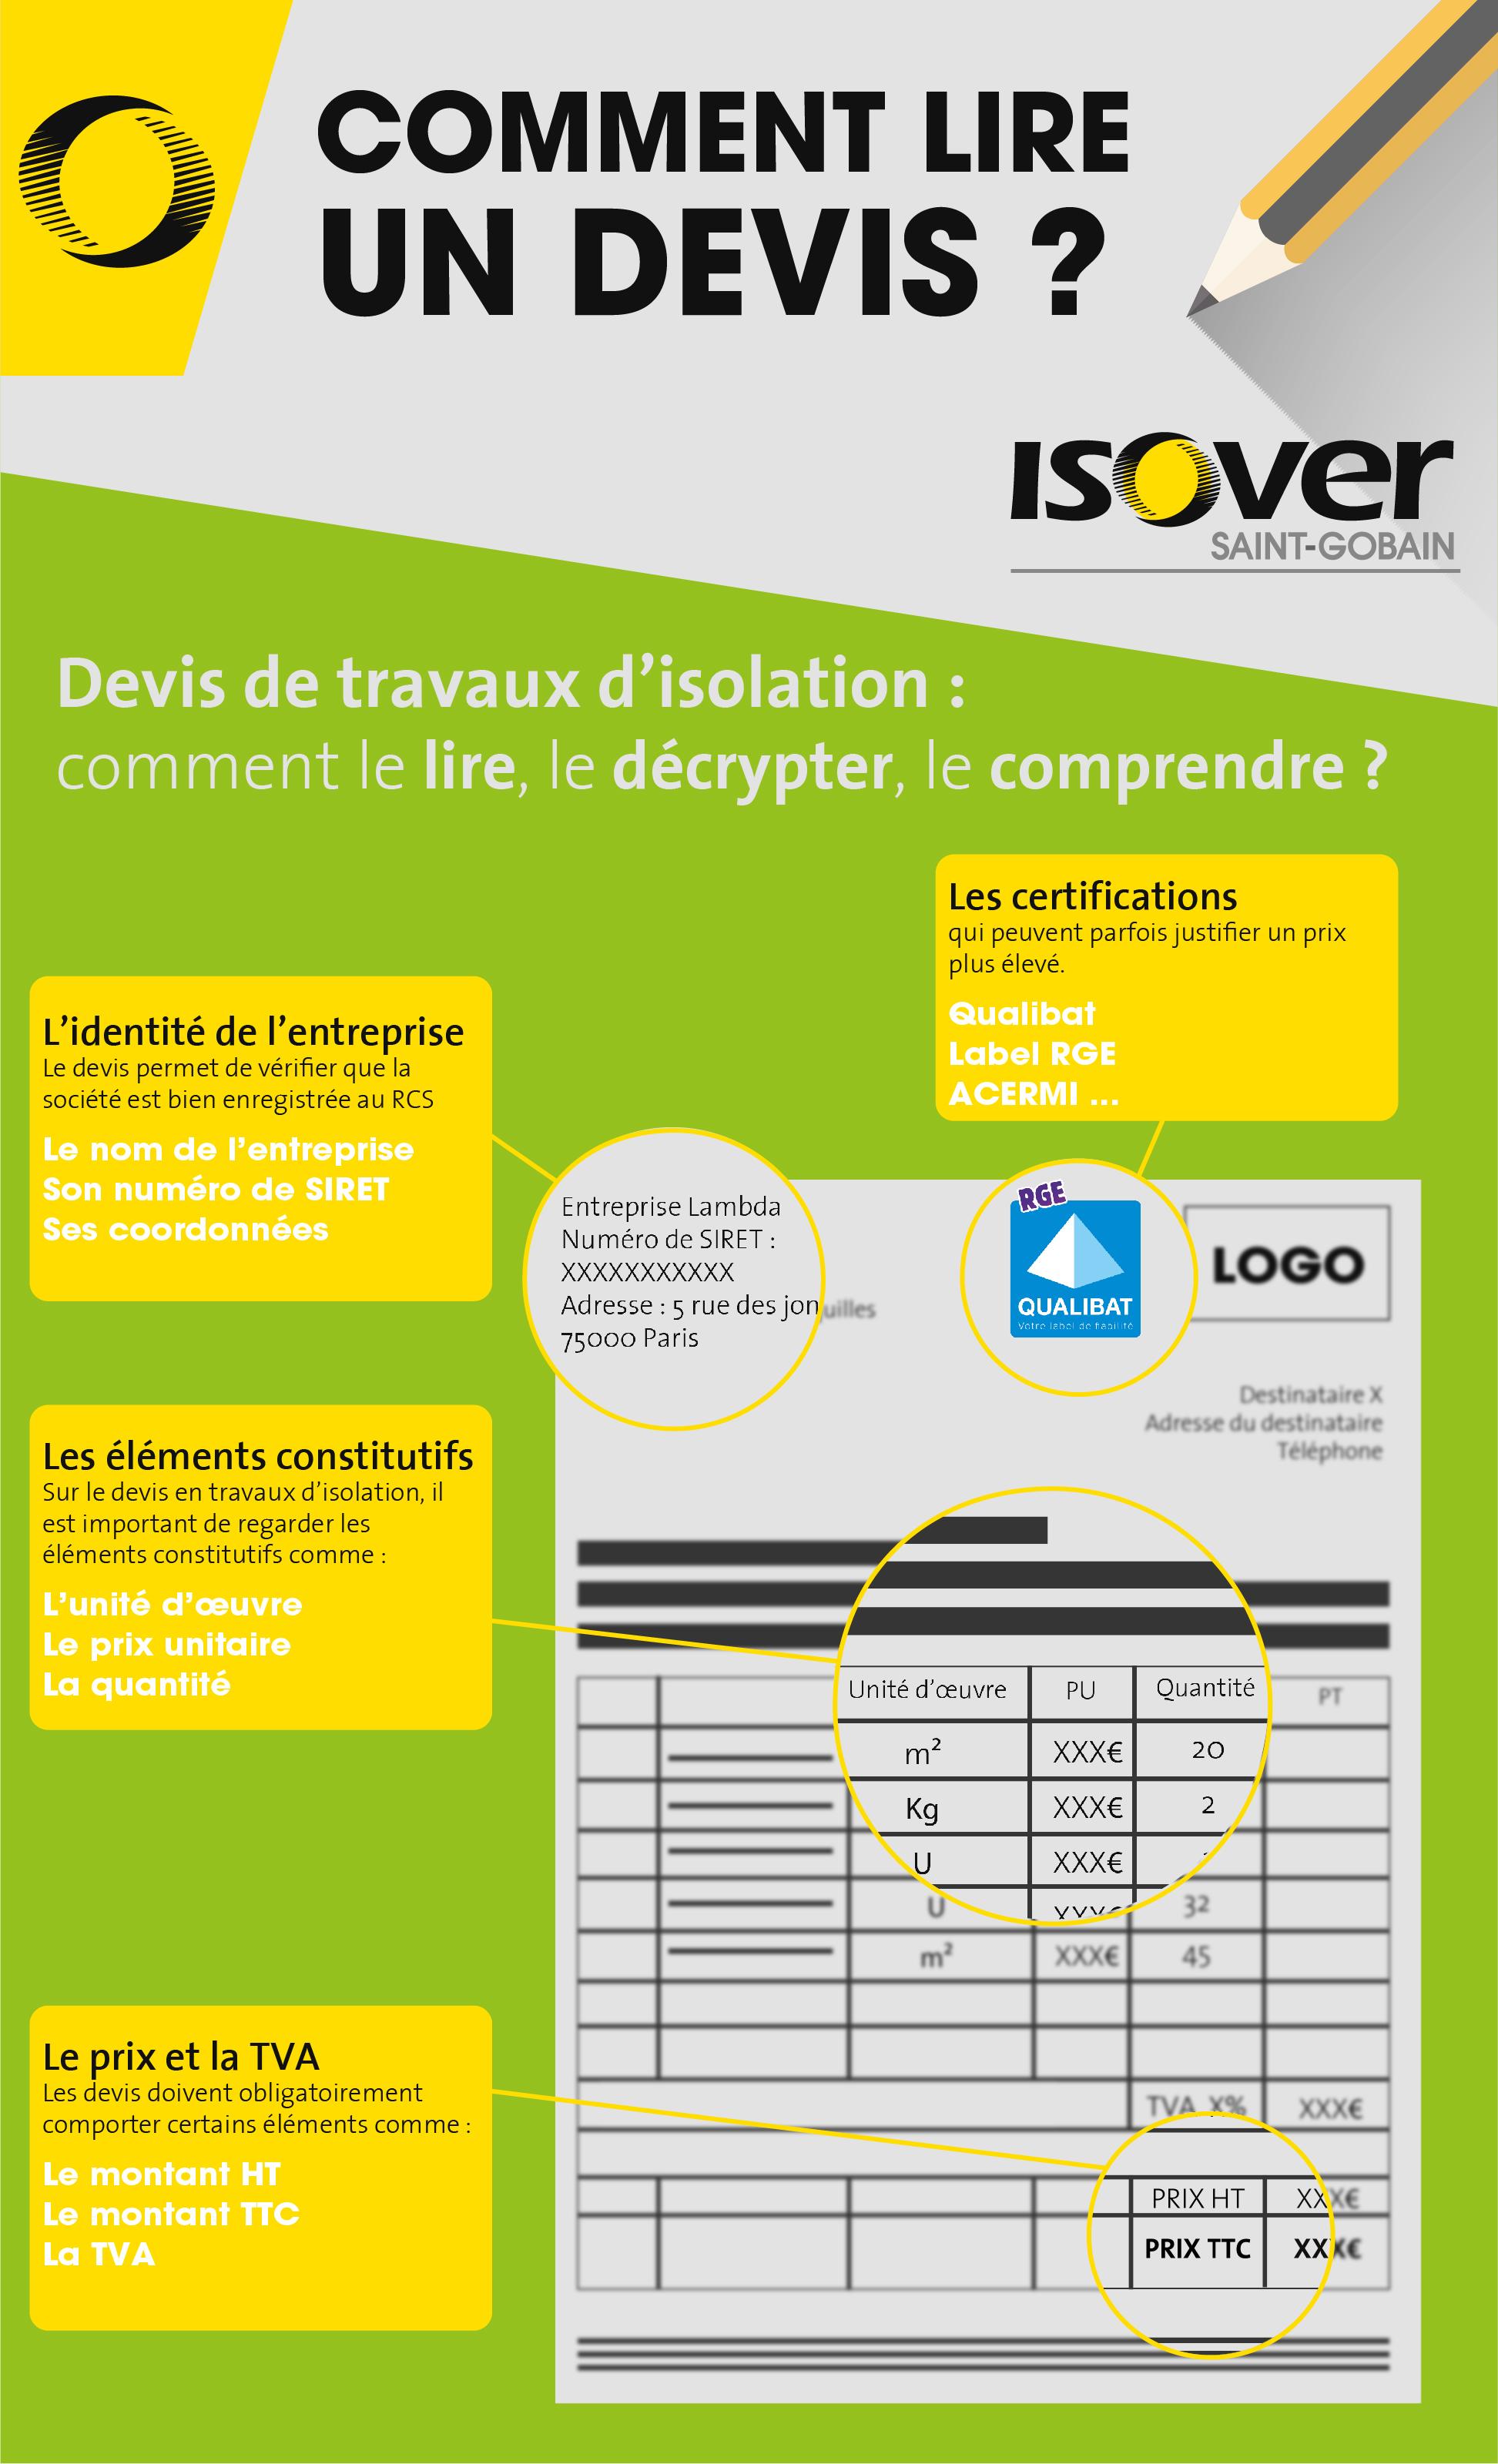 ISOVER_iconographie_-_Devis.jpg